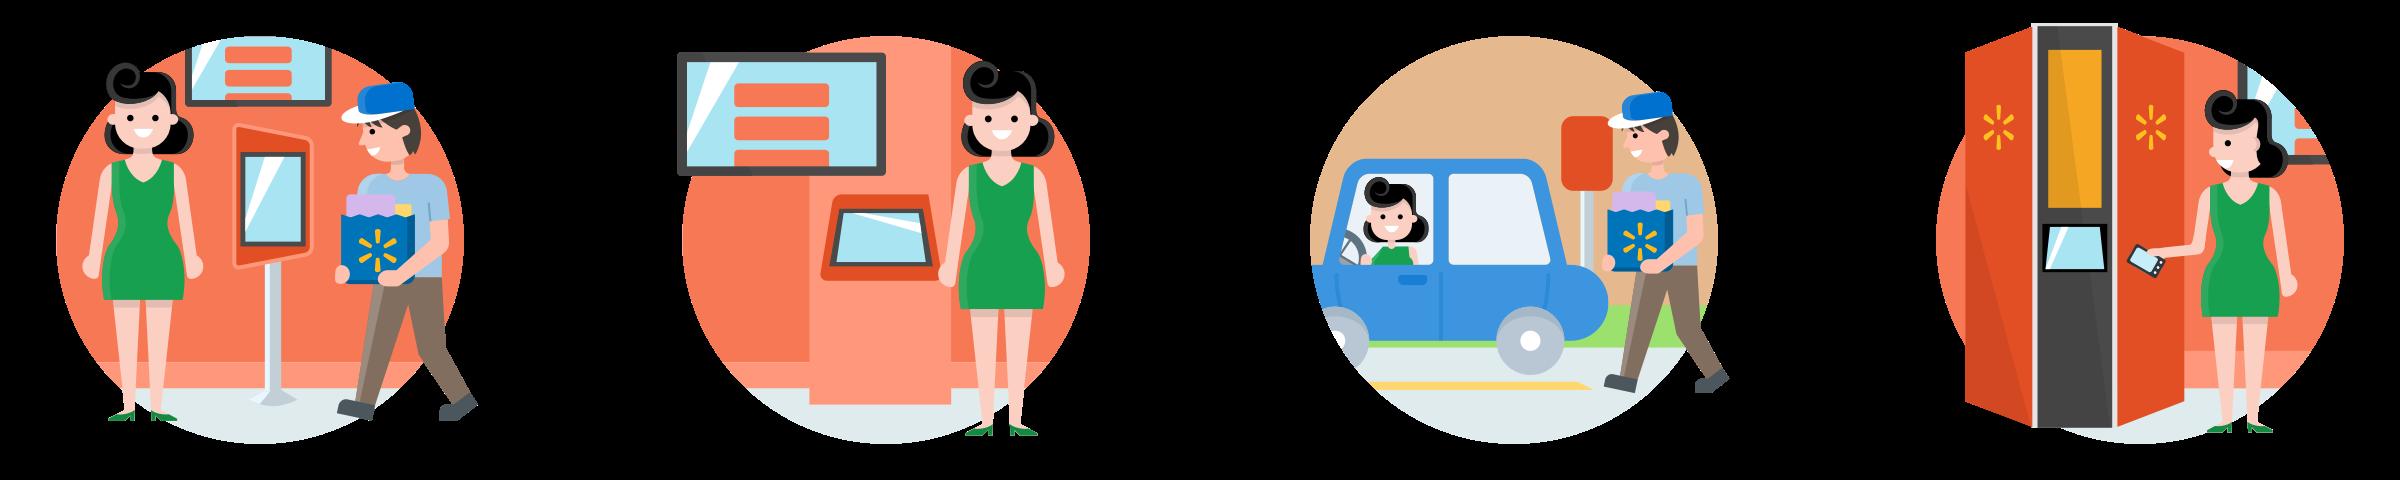 pickup-format-illustrations.png